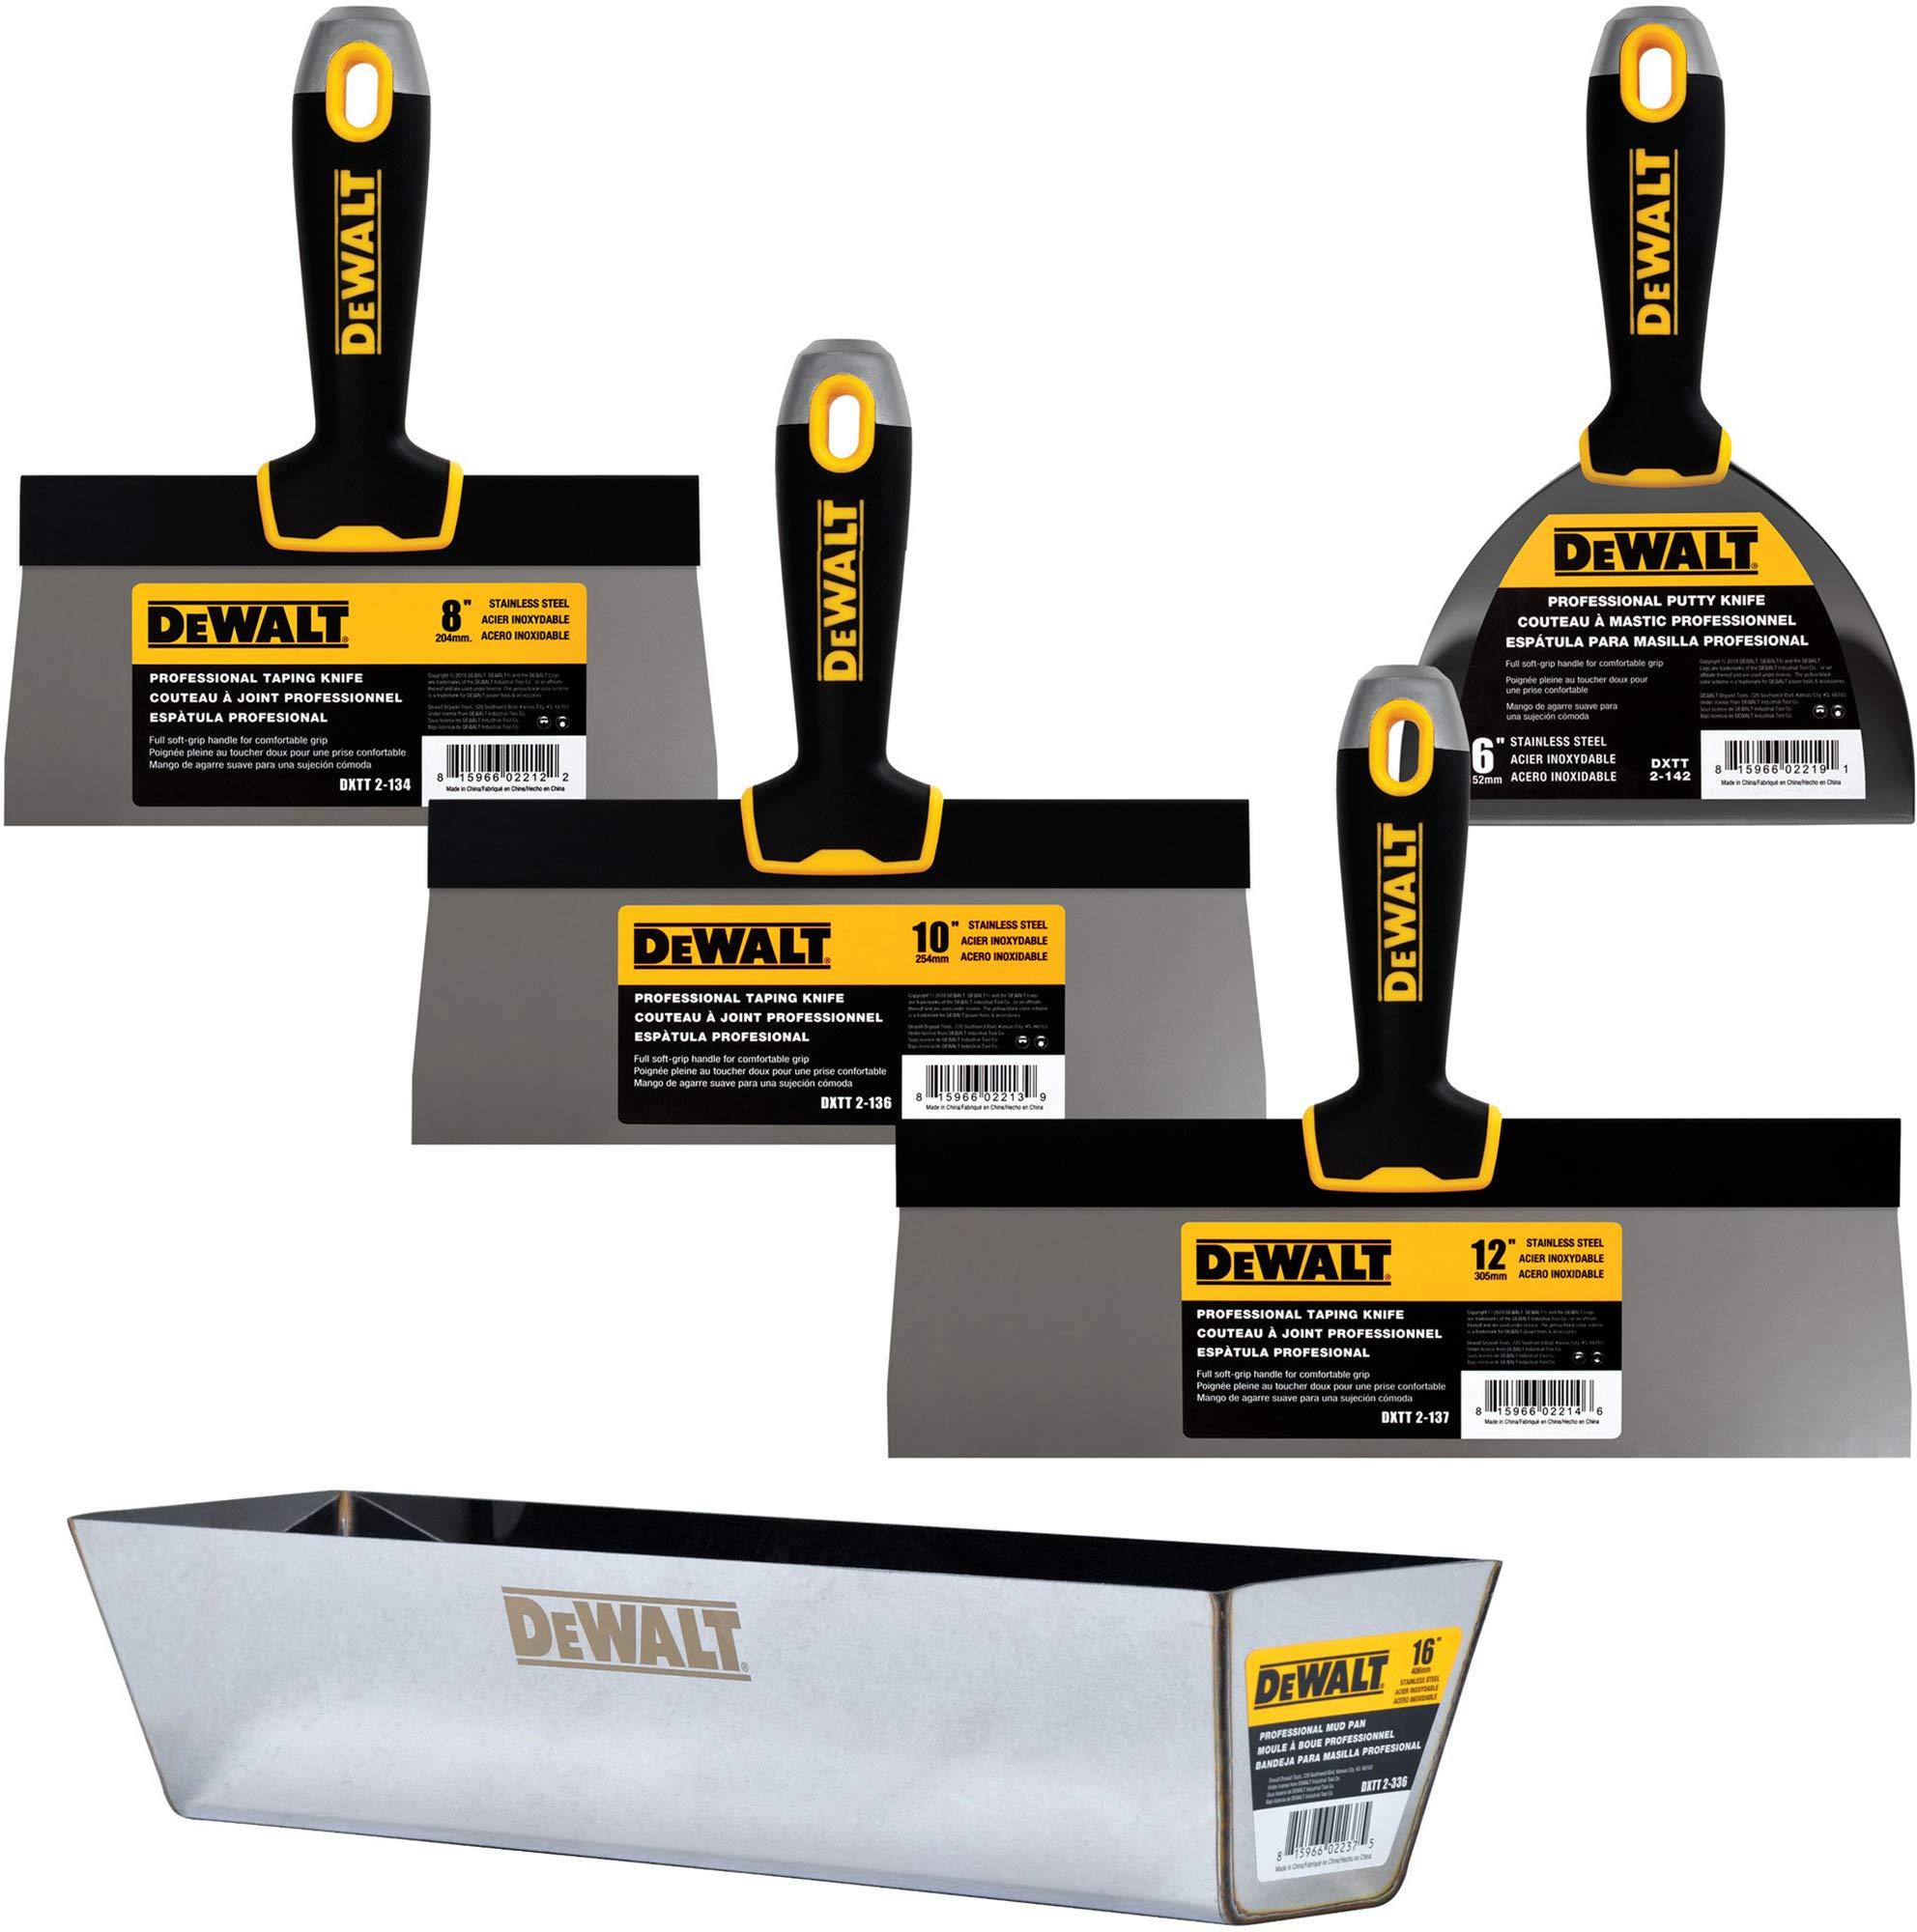 DEWALT Stainless Steel Taping Knife & Mud Pan Set + FREE BONUS 6'' Soft Grip Putty Knife | 8/10/12-Inch Blades | Soft Grip Handles | DXTT-3-173 by DEWALT